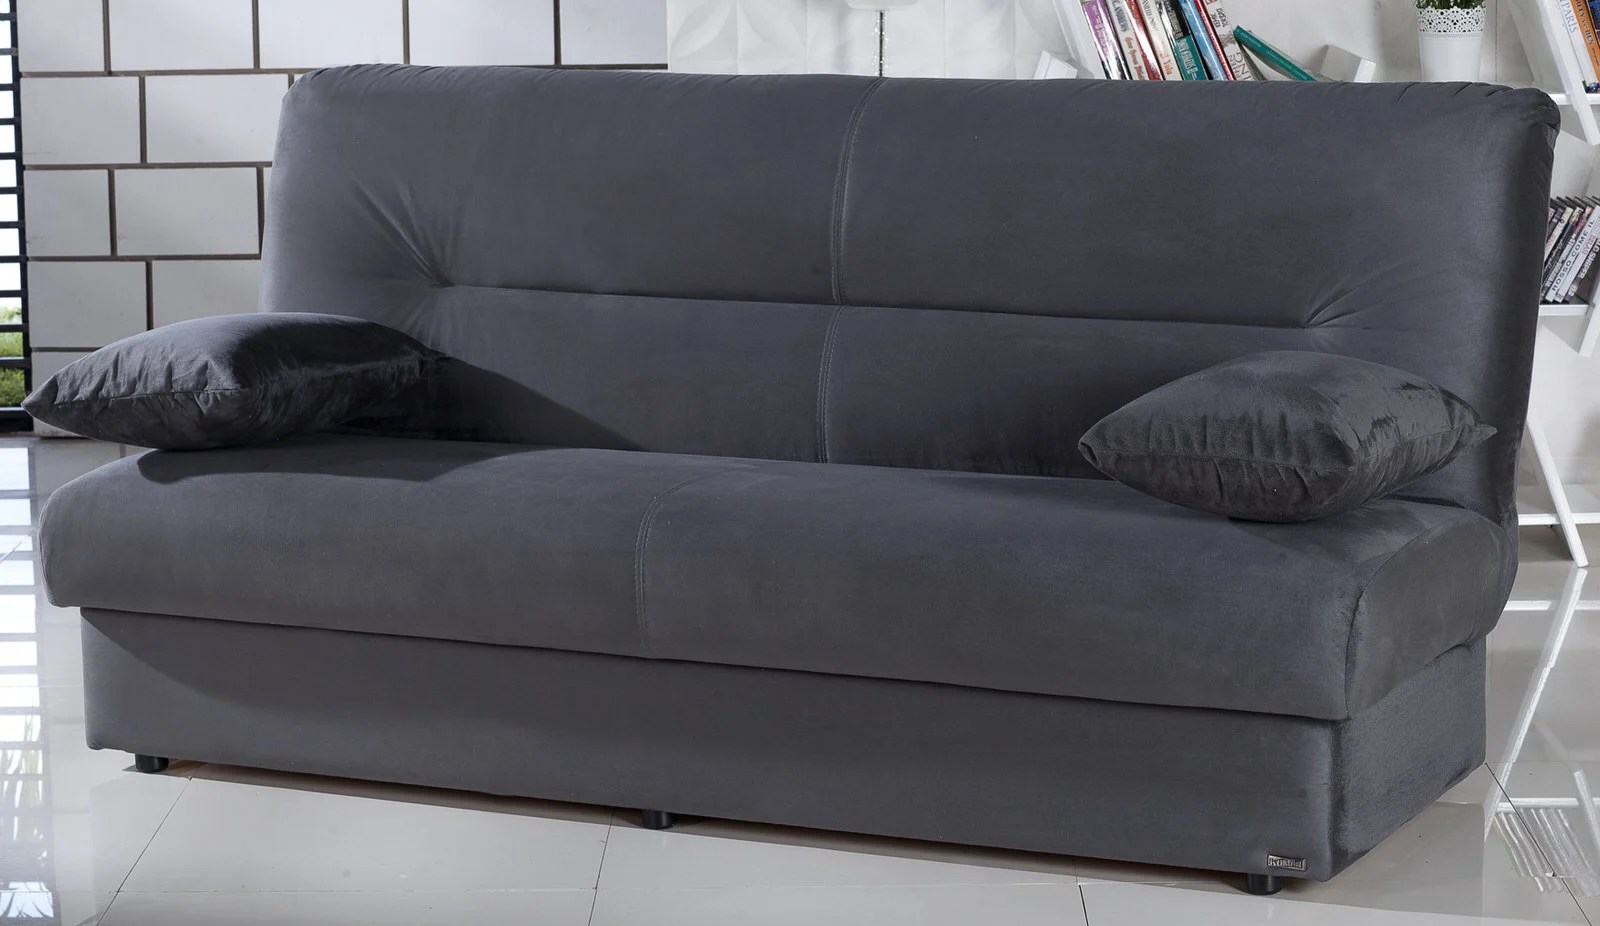 usa made sleeper sofa gray furniture regata rainbow dark convertible bed by istikbal ...